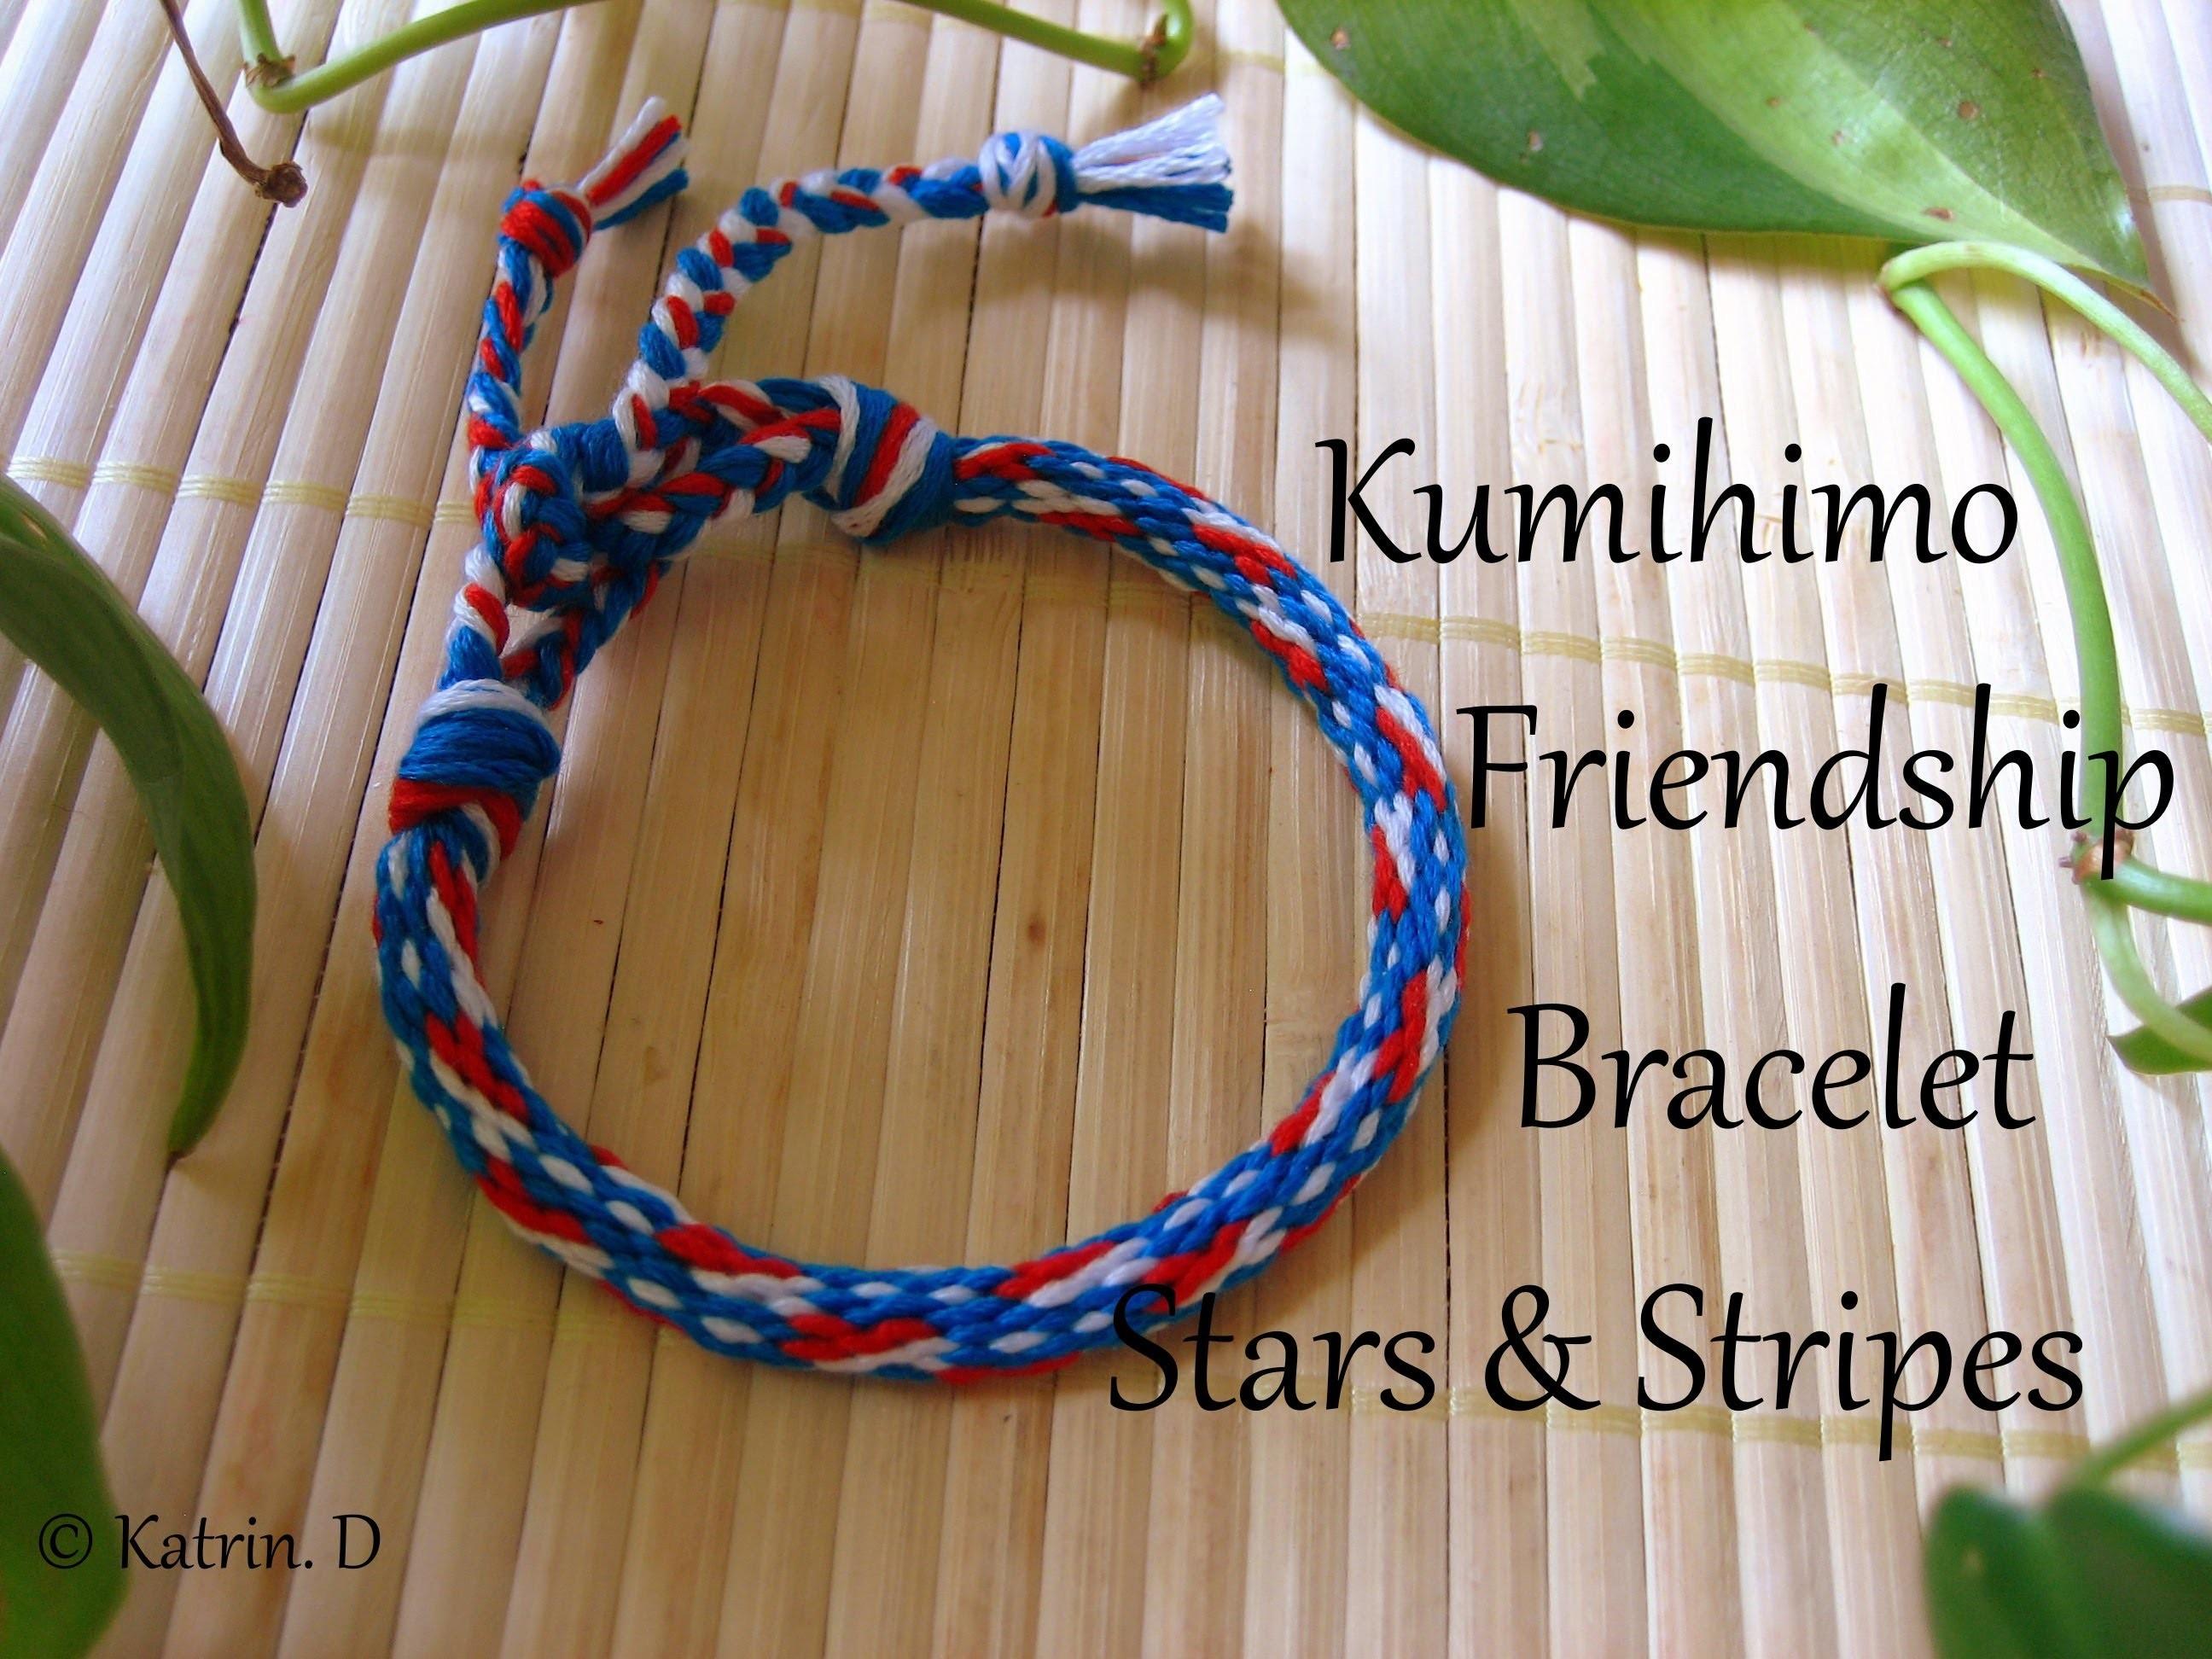 Kumihimo Friendship Bracelet Stars & Stripes